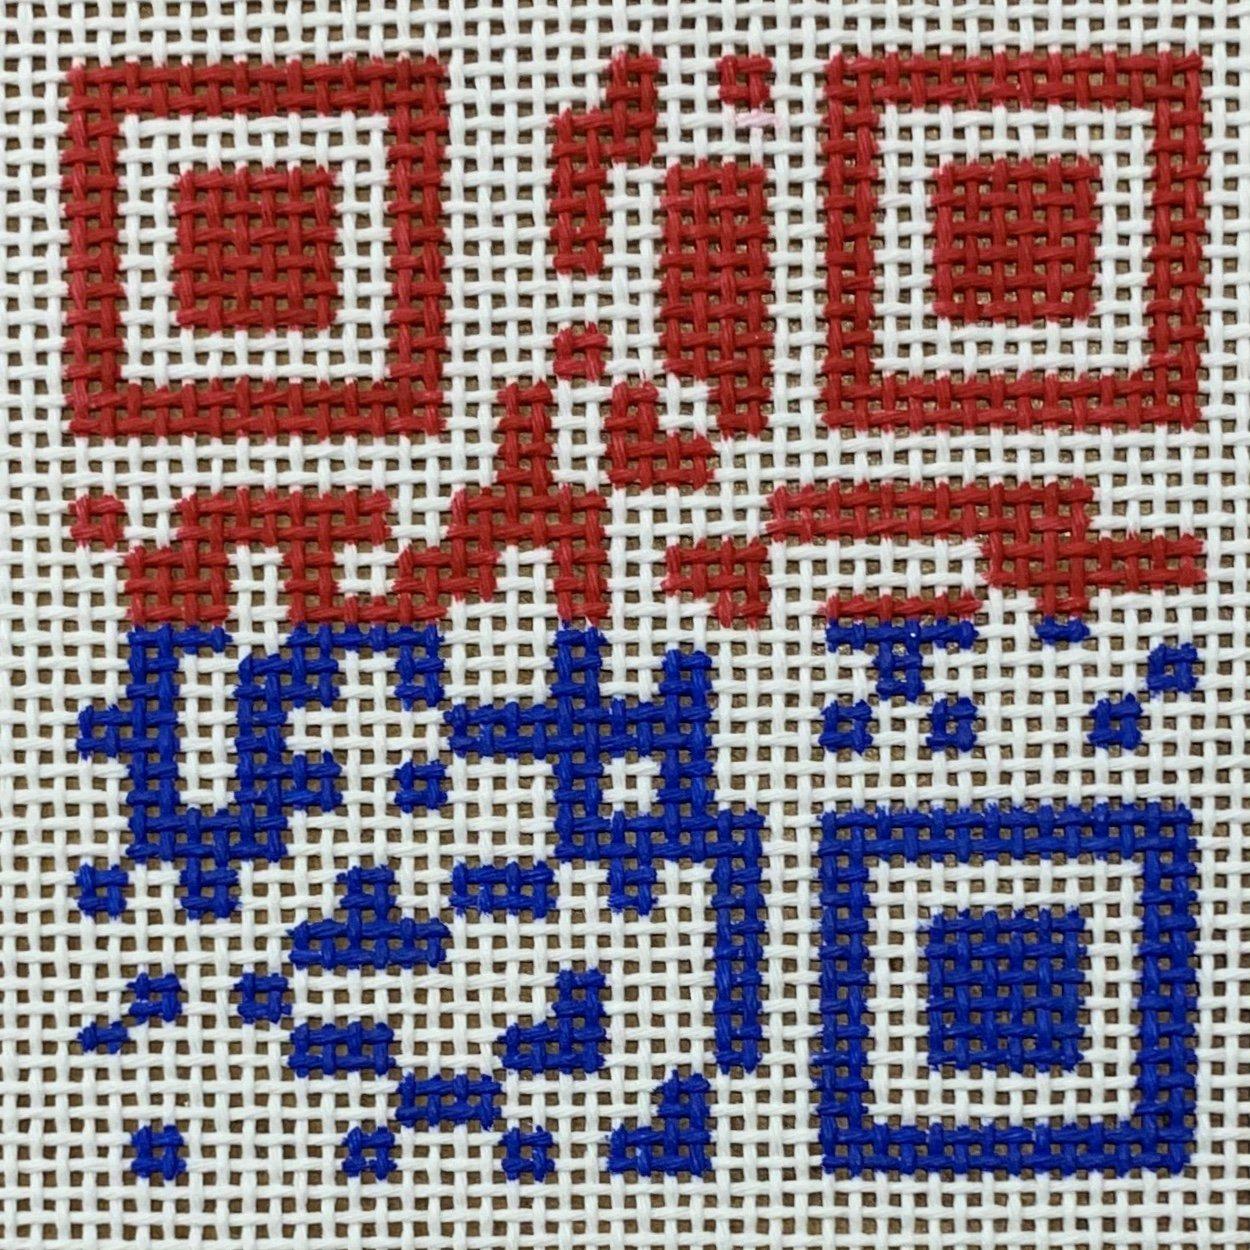 VOTE! QR Code